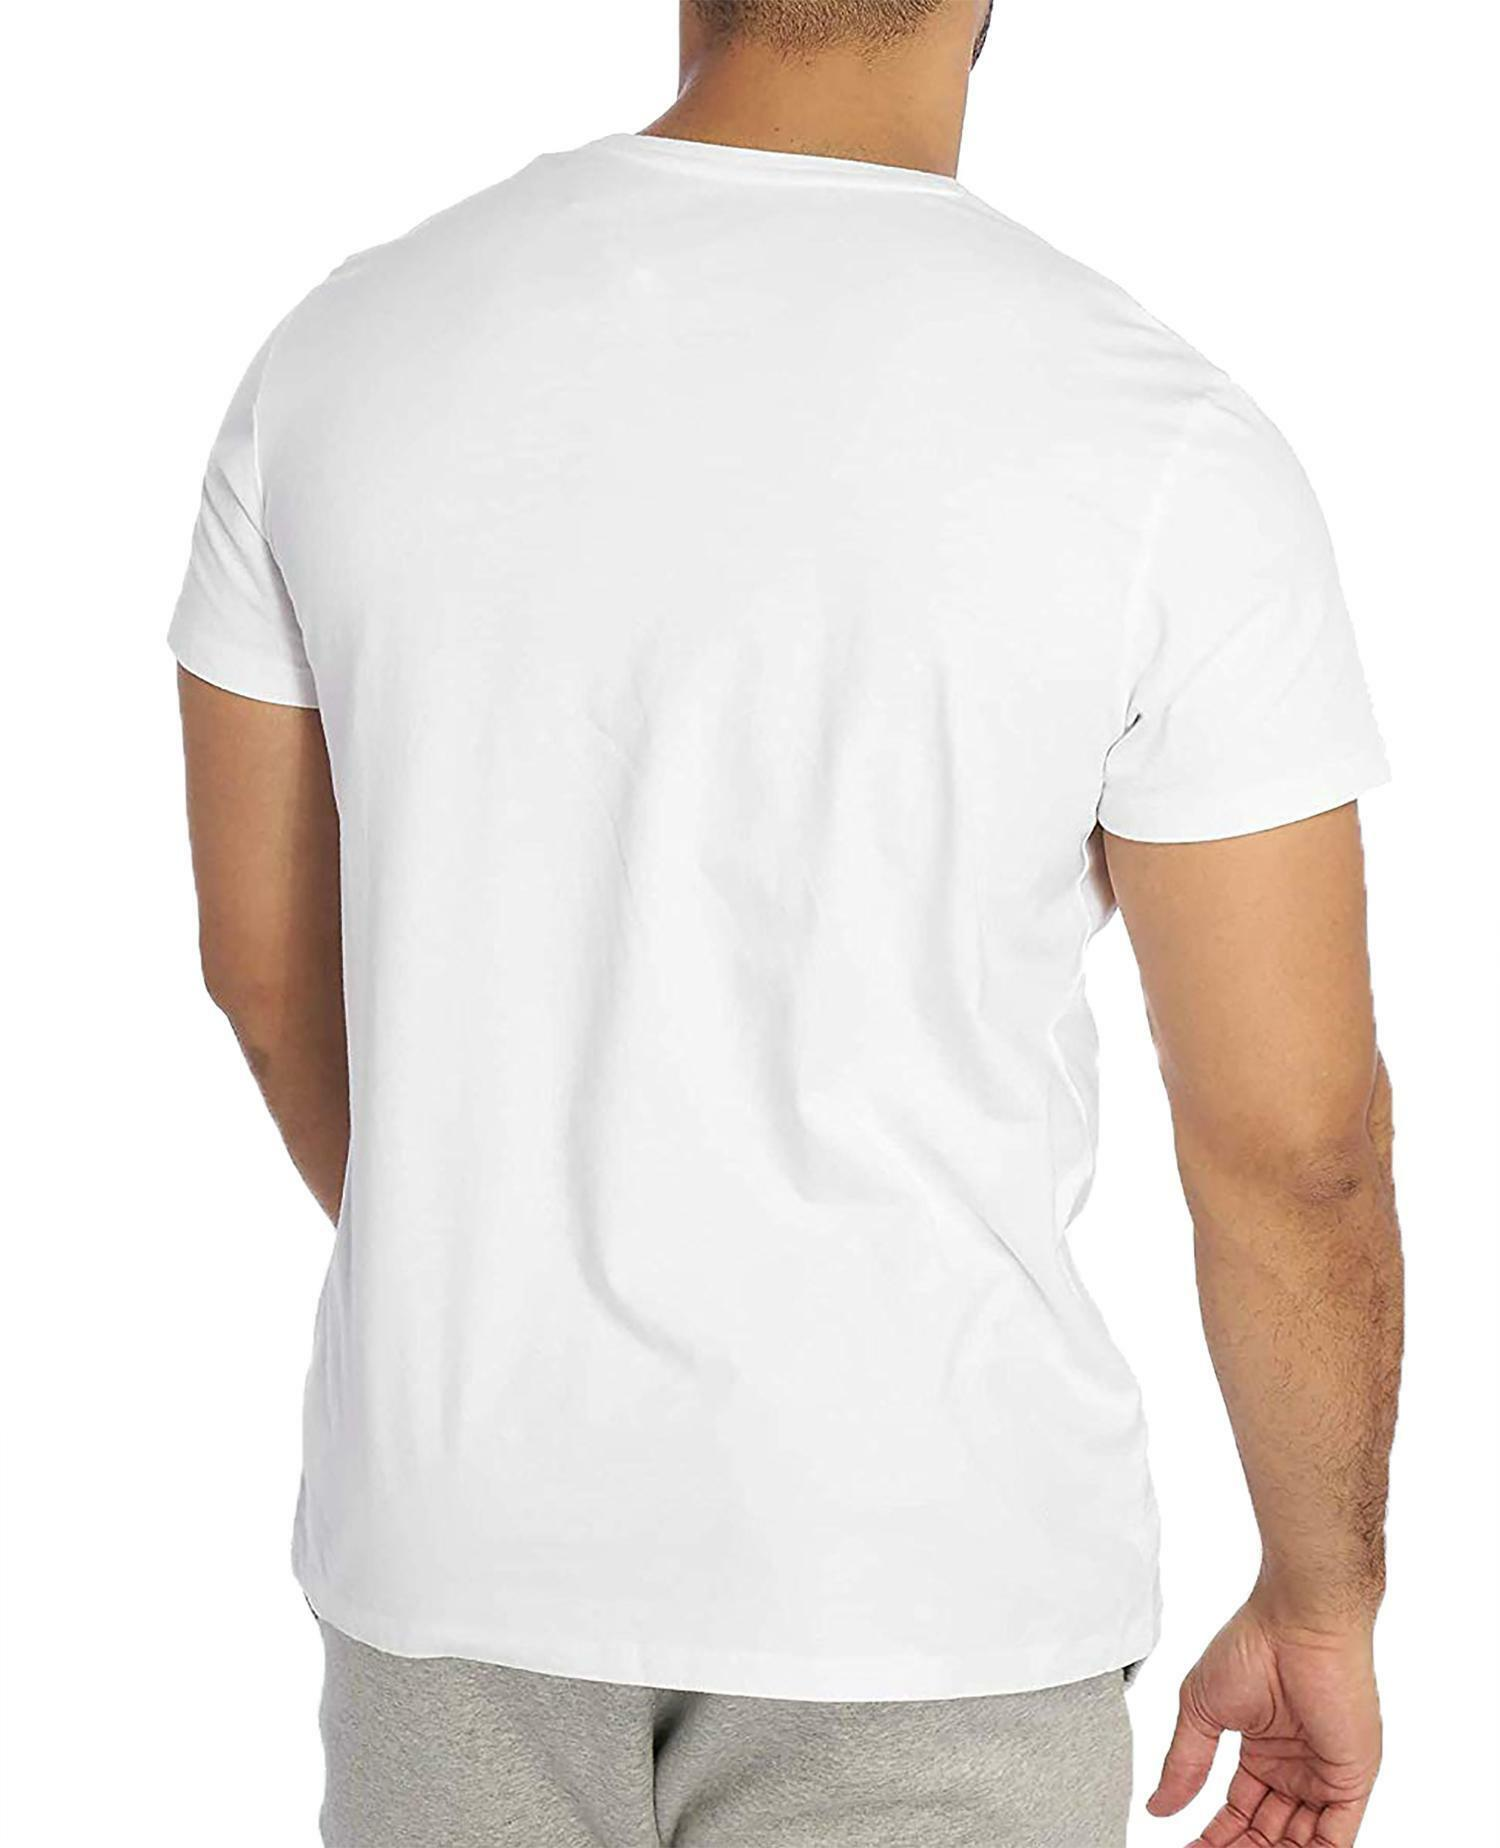 timberland timberland t-shirt uomo bianca tb0a1l60h79